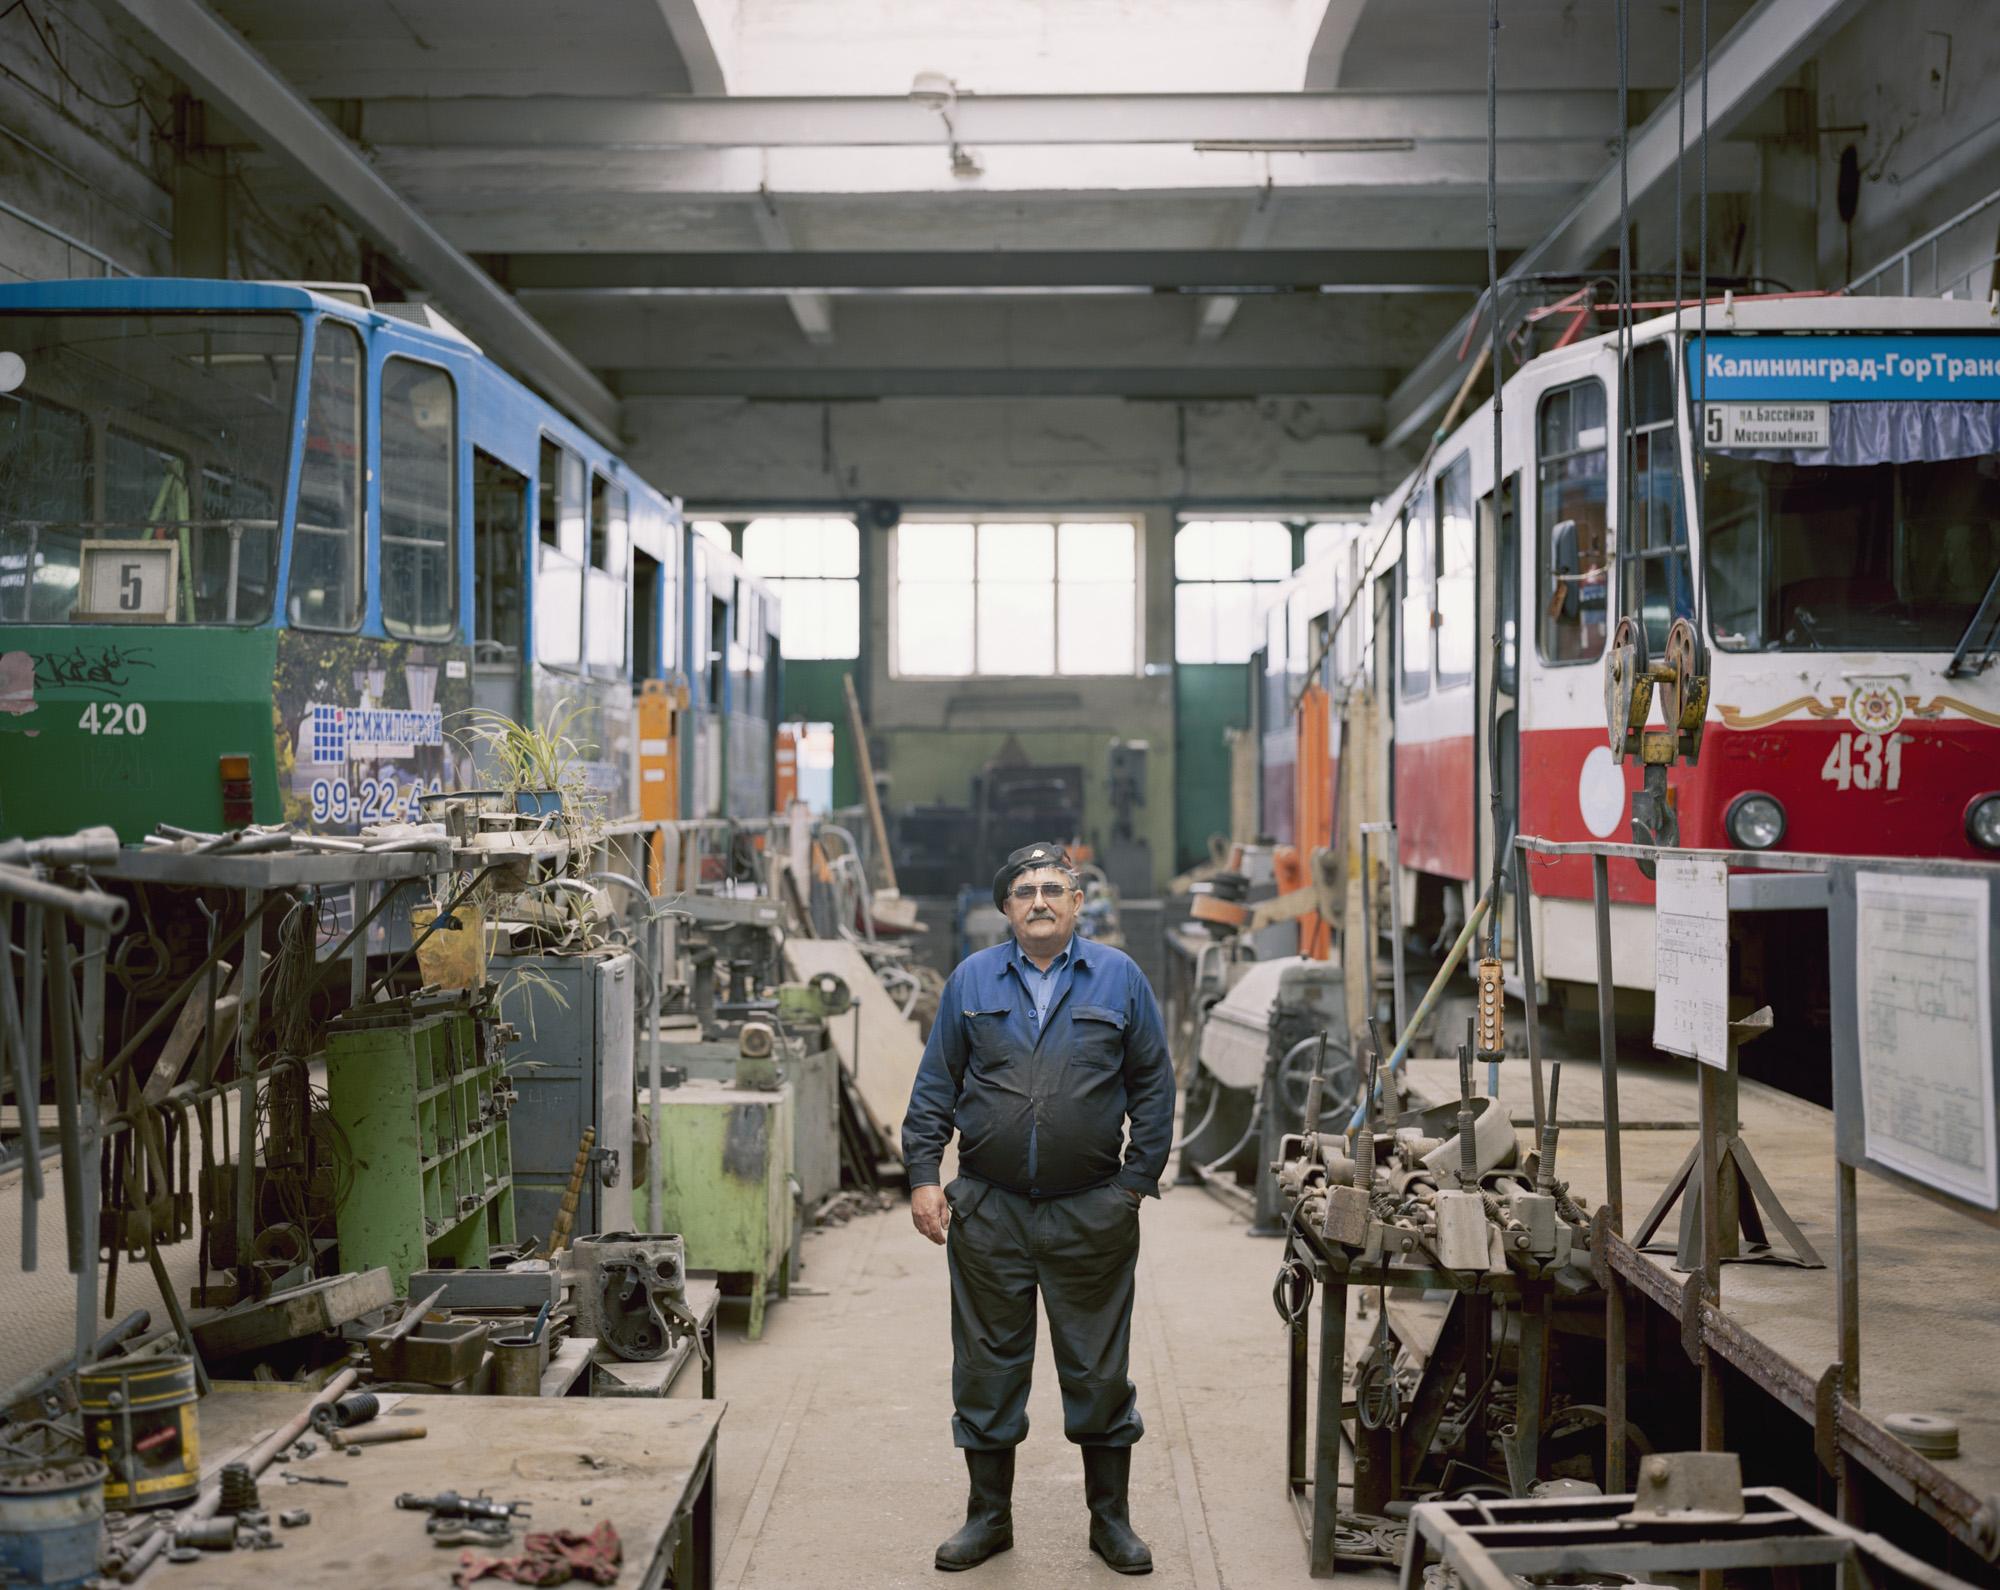 31-Tram-depo-engineer-Viktor-Evstafevic-Klimov